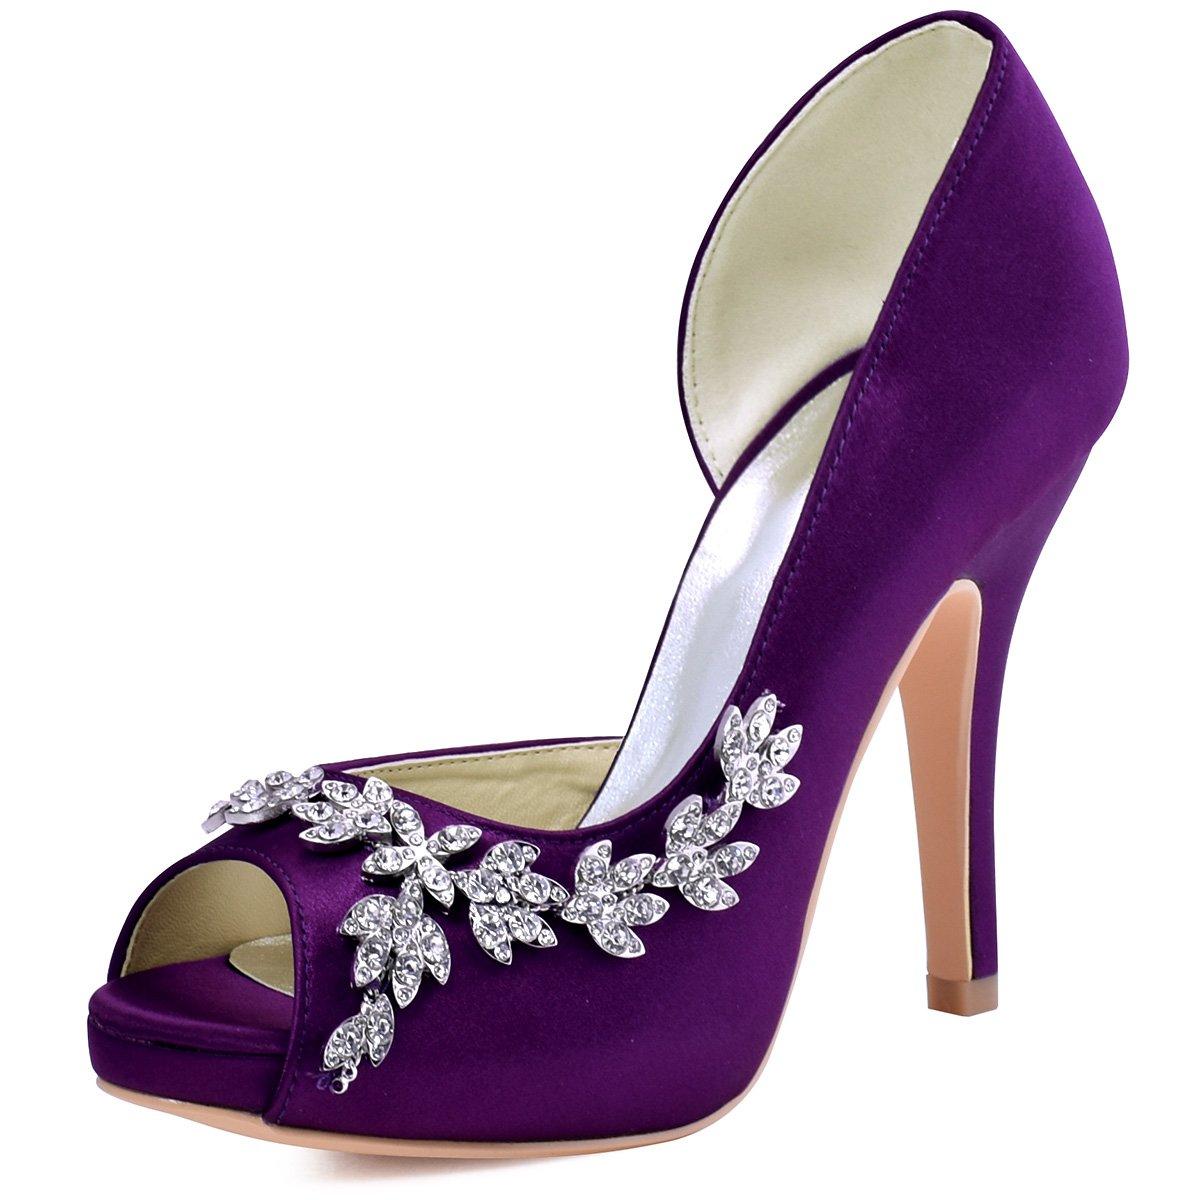 ElegantPark EP11045-IP Mujer Plataforma Peep Toe Tac/ón Aguja Arcos Satin Zapatos De Boda Novia